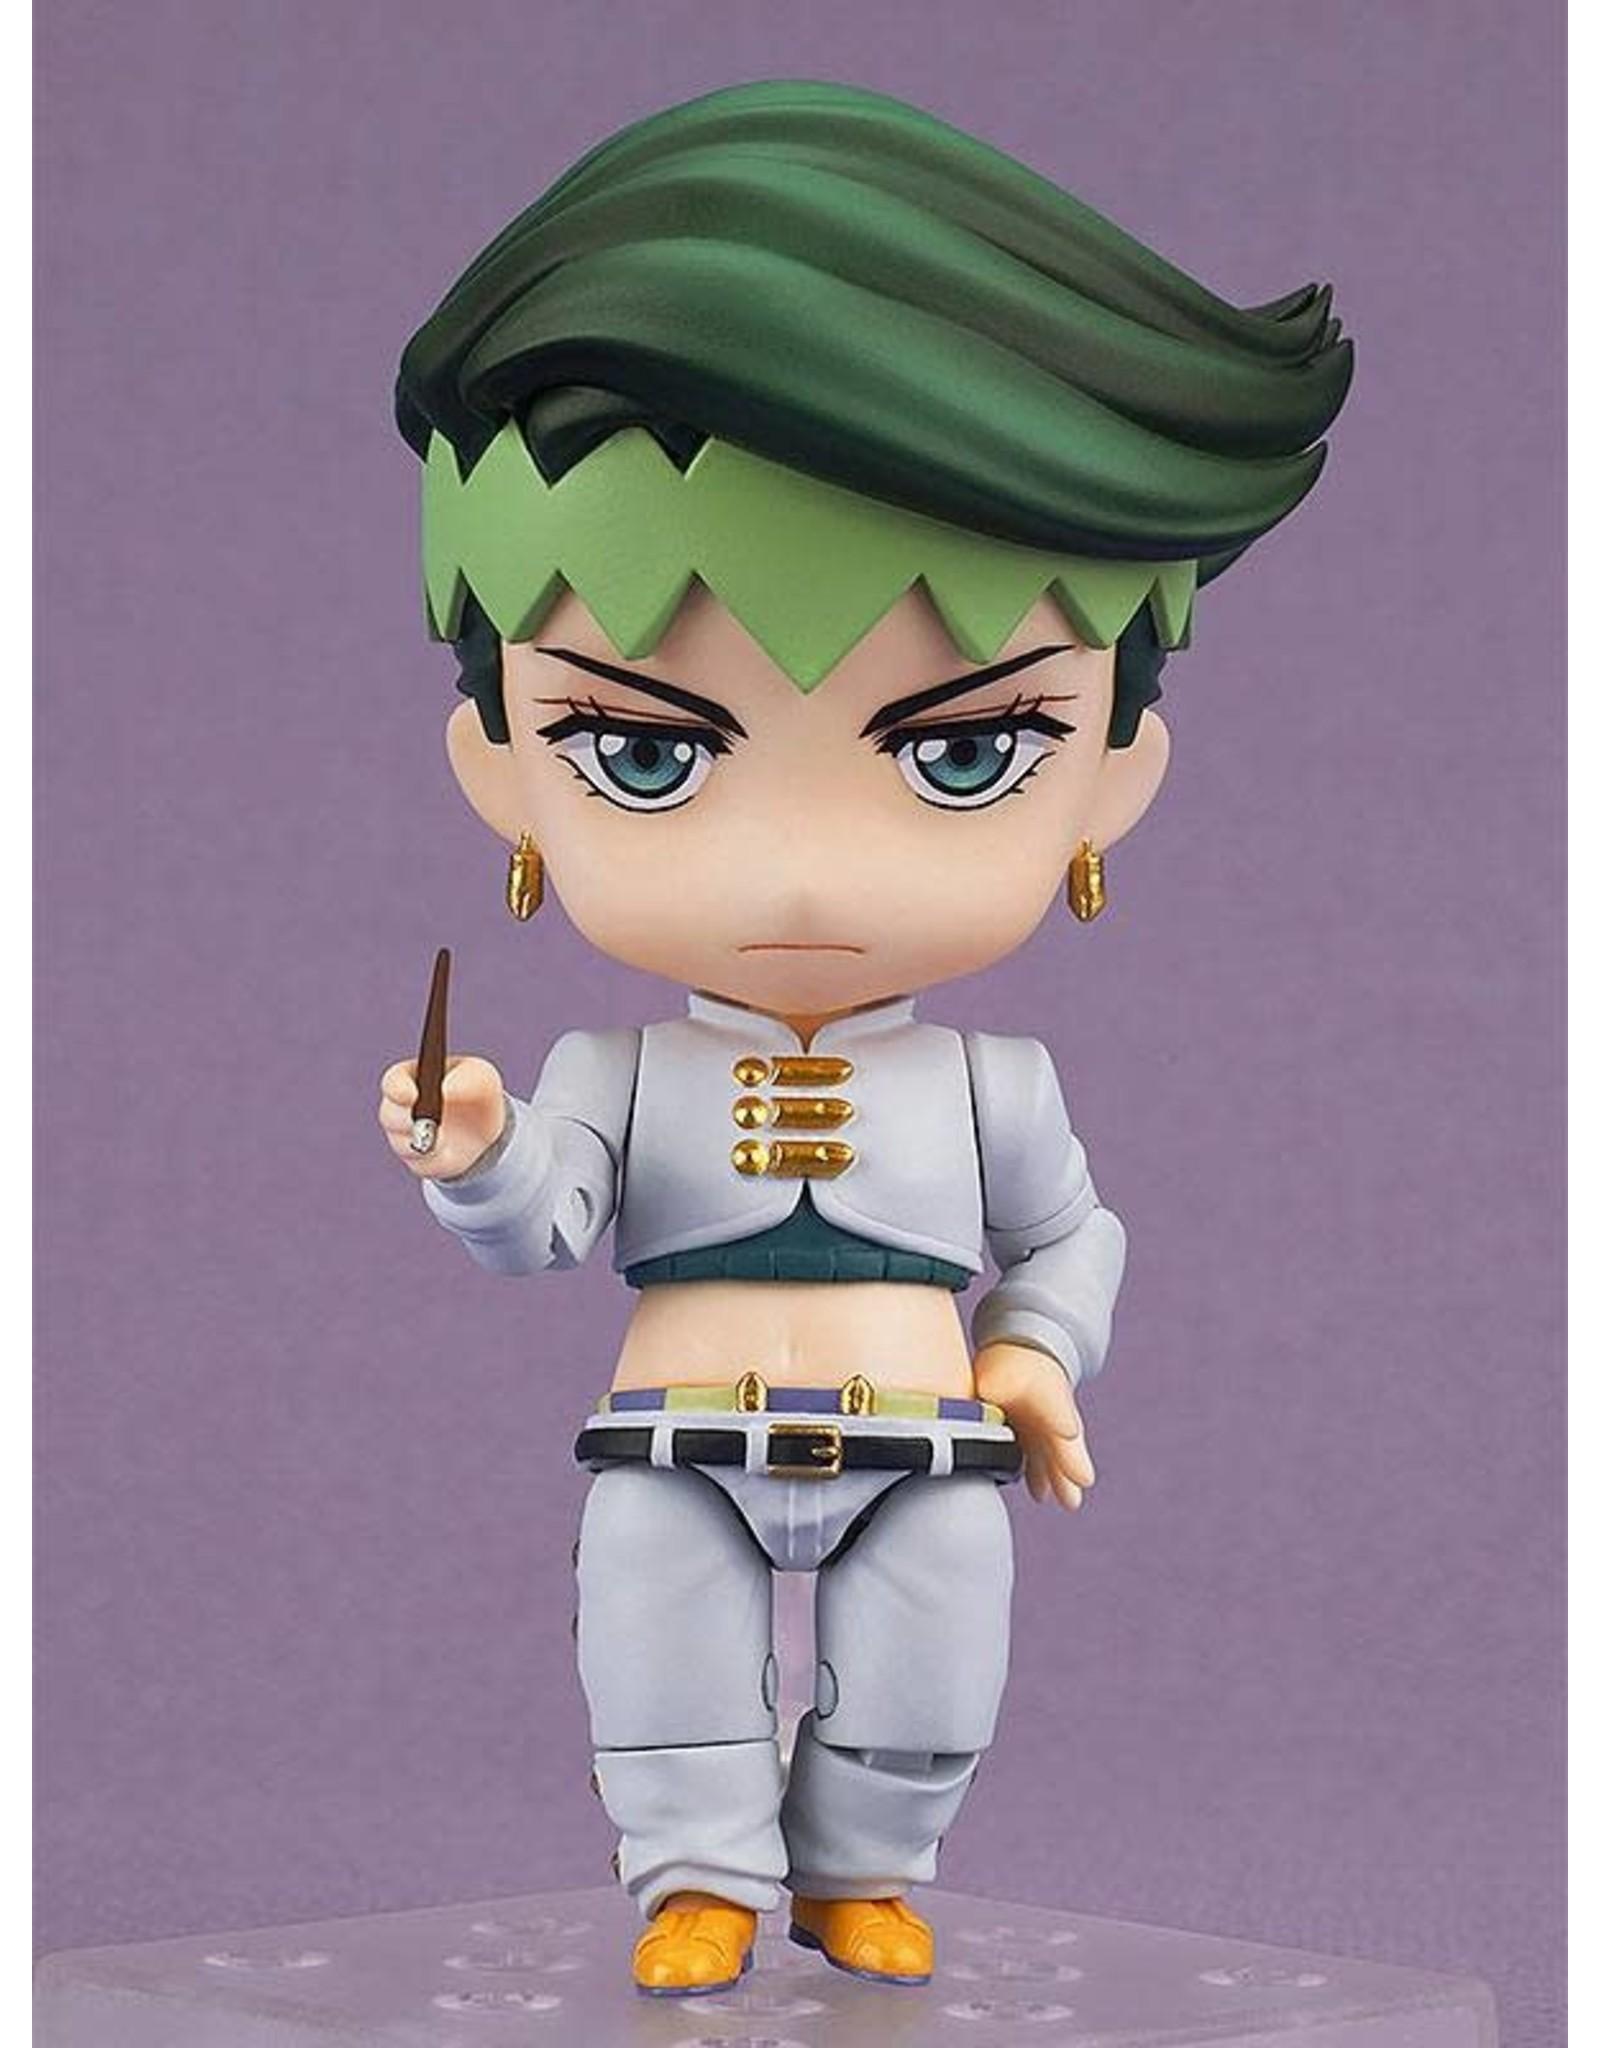 Jojo's Bizarre Adventure: Diamond is Unbreakable - Rohan Kishibe - Nendoroid 1256